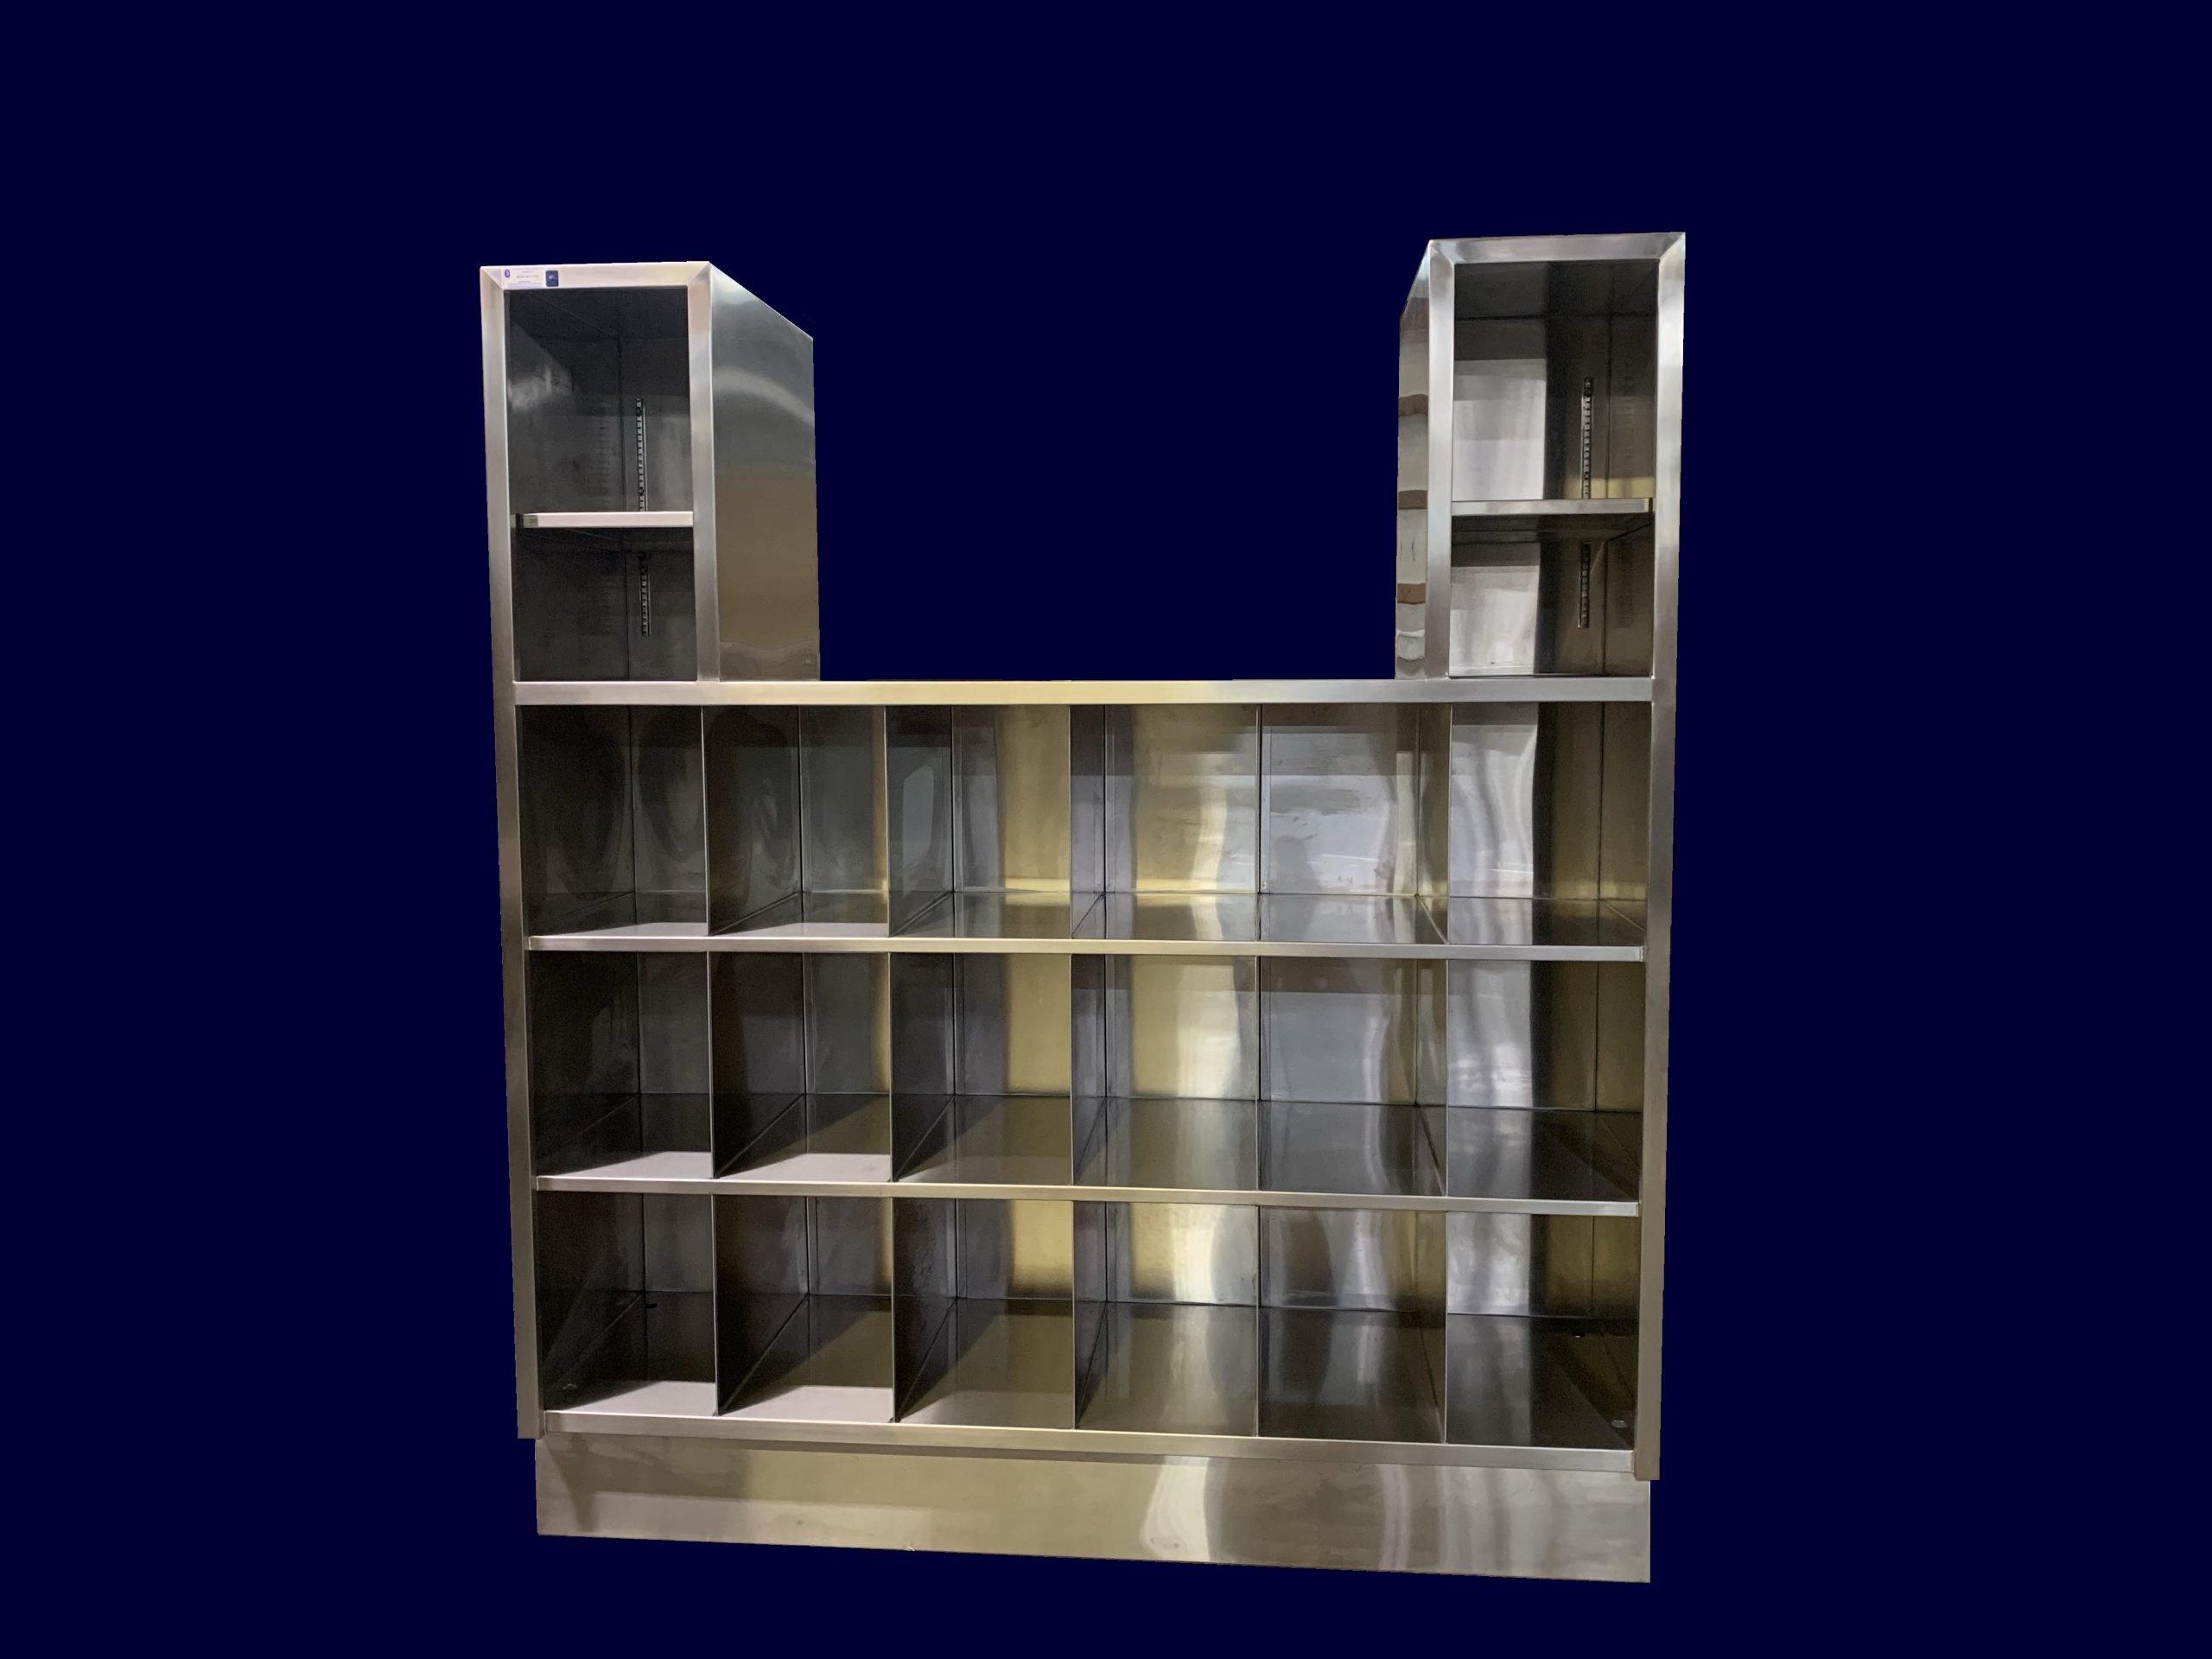 Custom Stainless Steel TV Cabinet